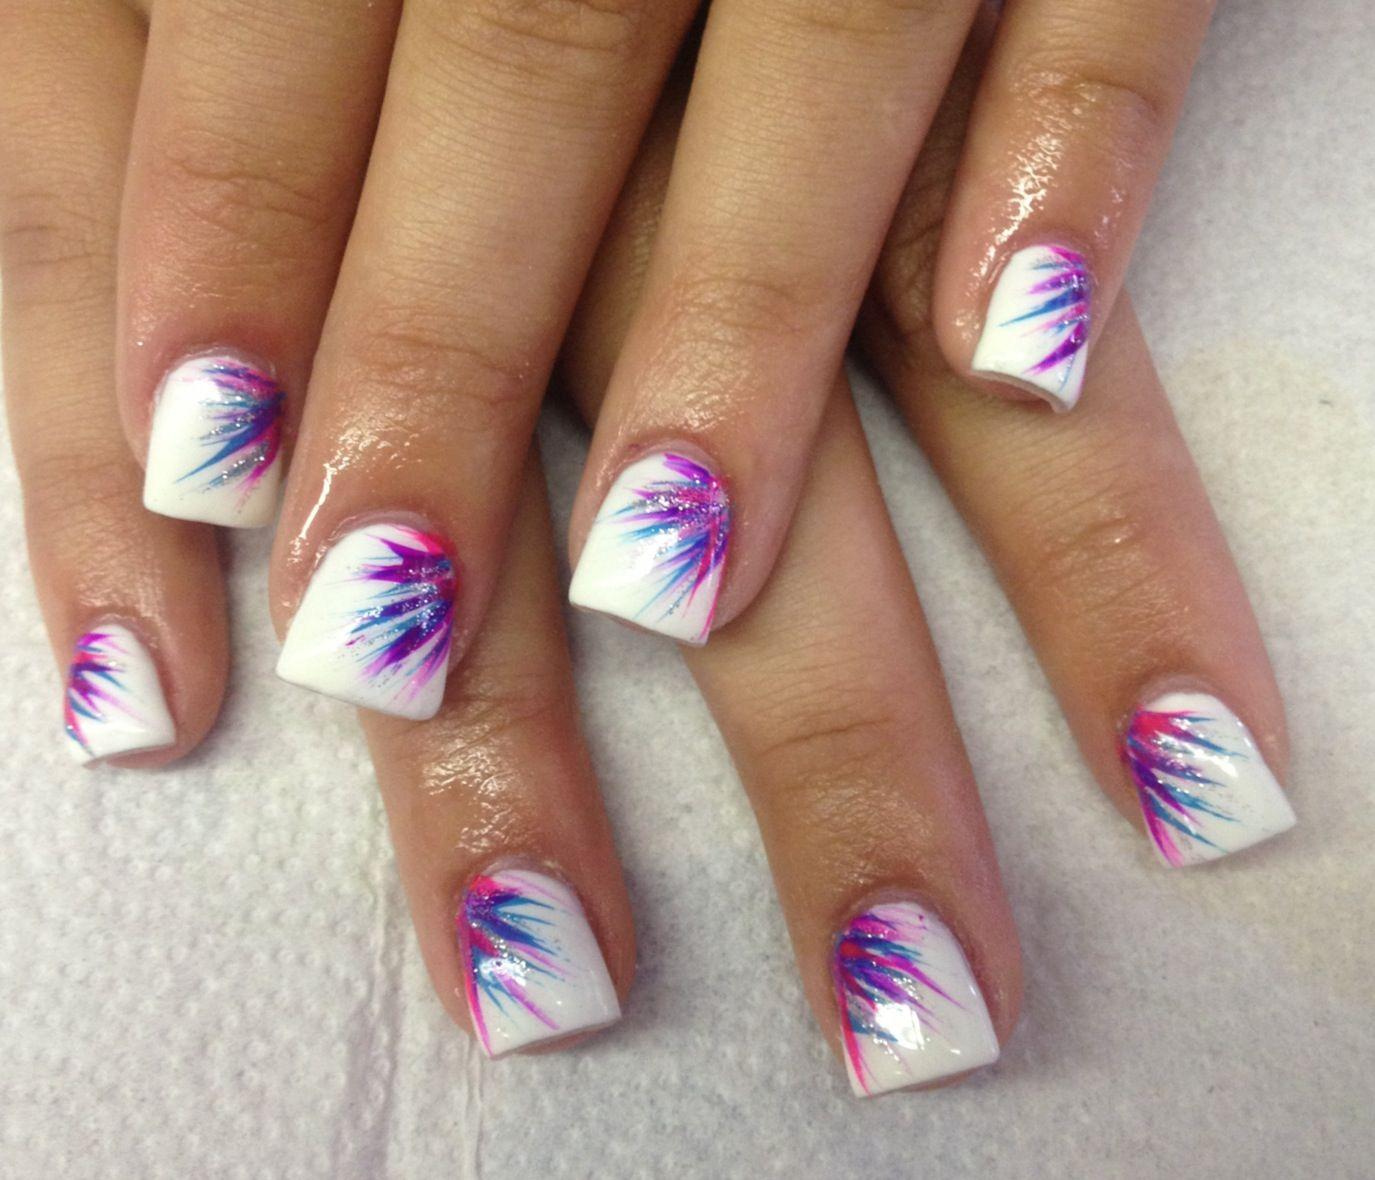 Fun flared starburst nails | Nail Designs | Pinterest | Fun nails ...